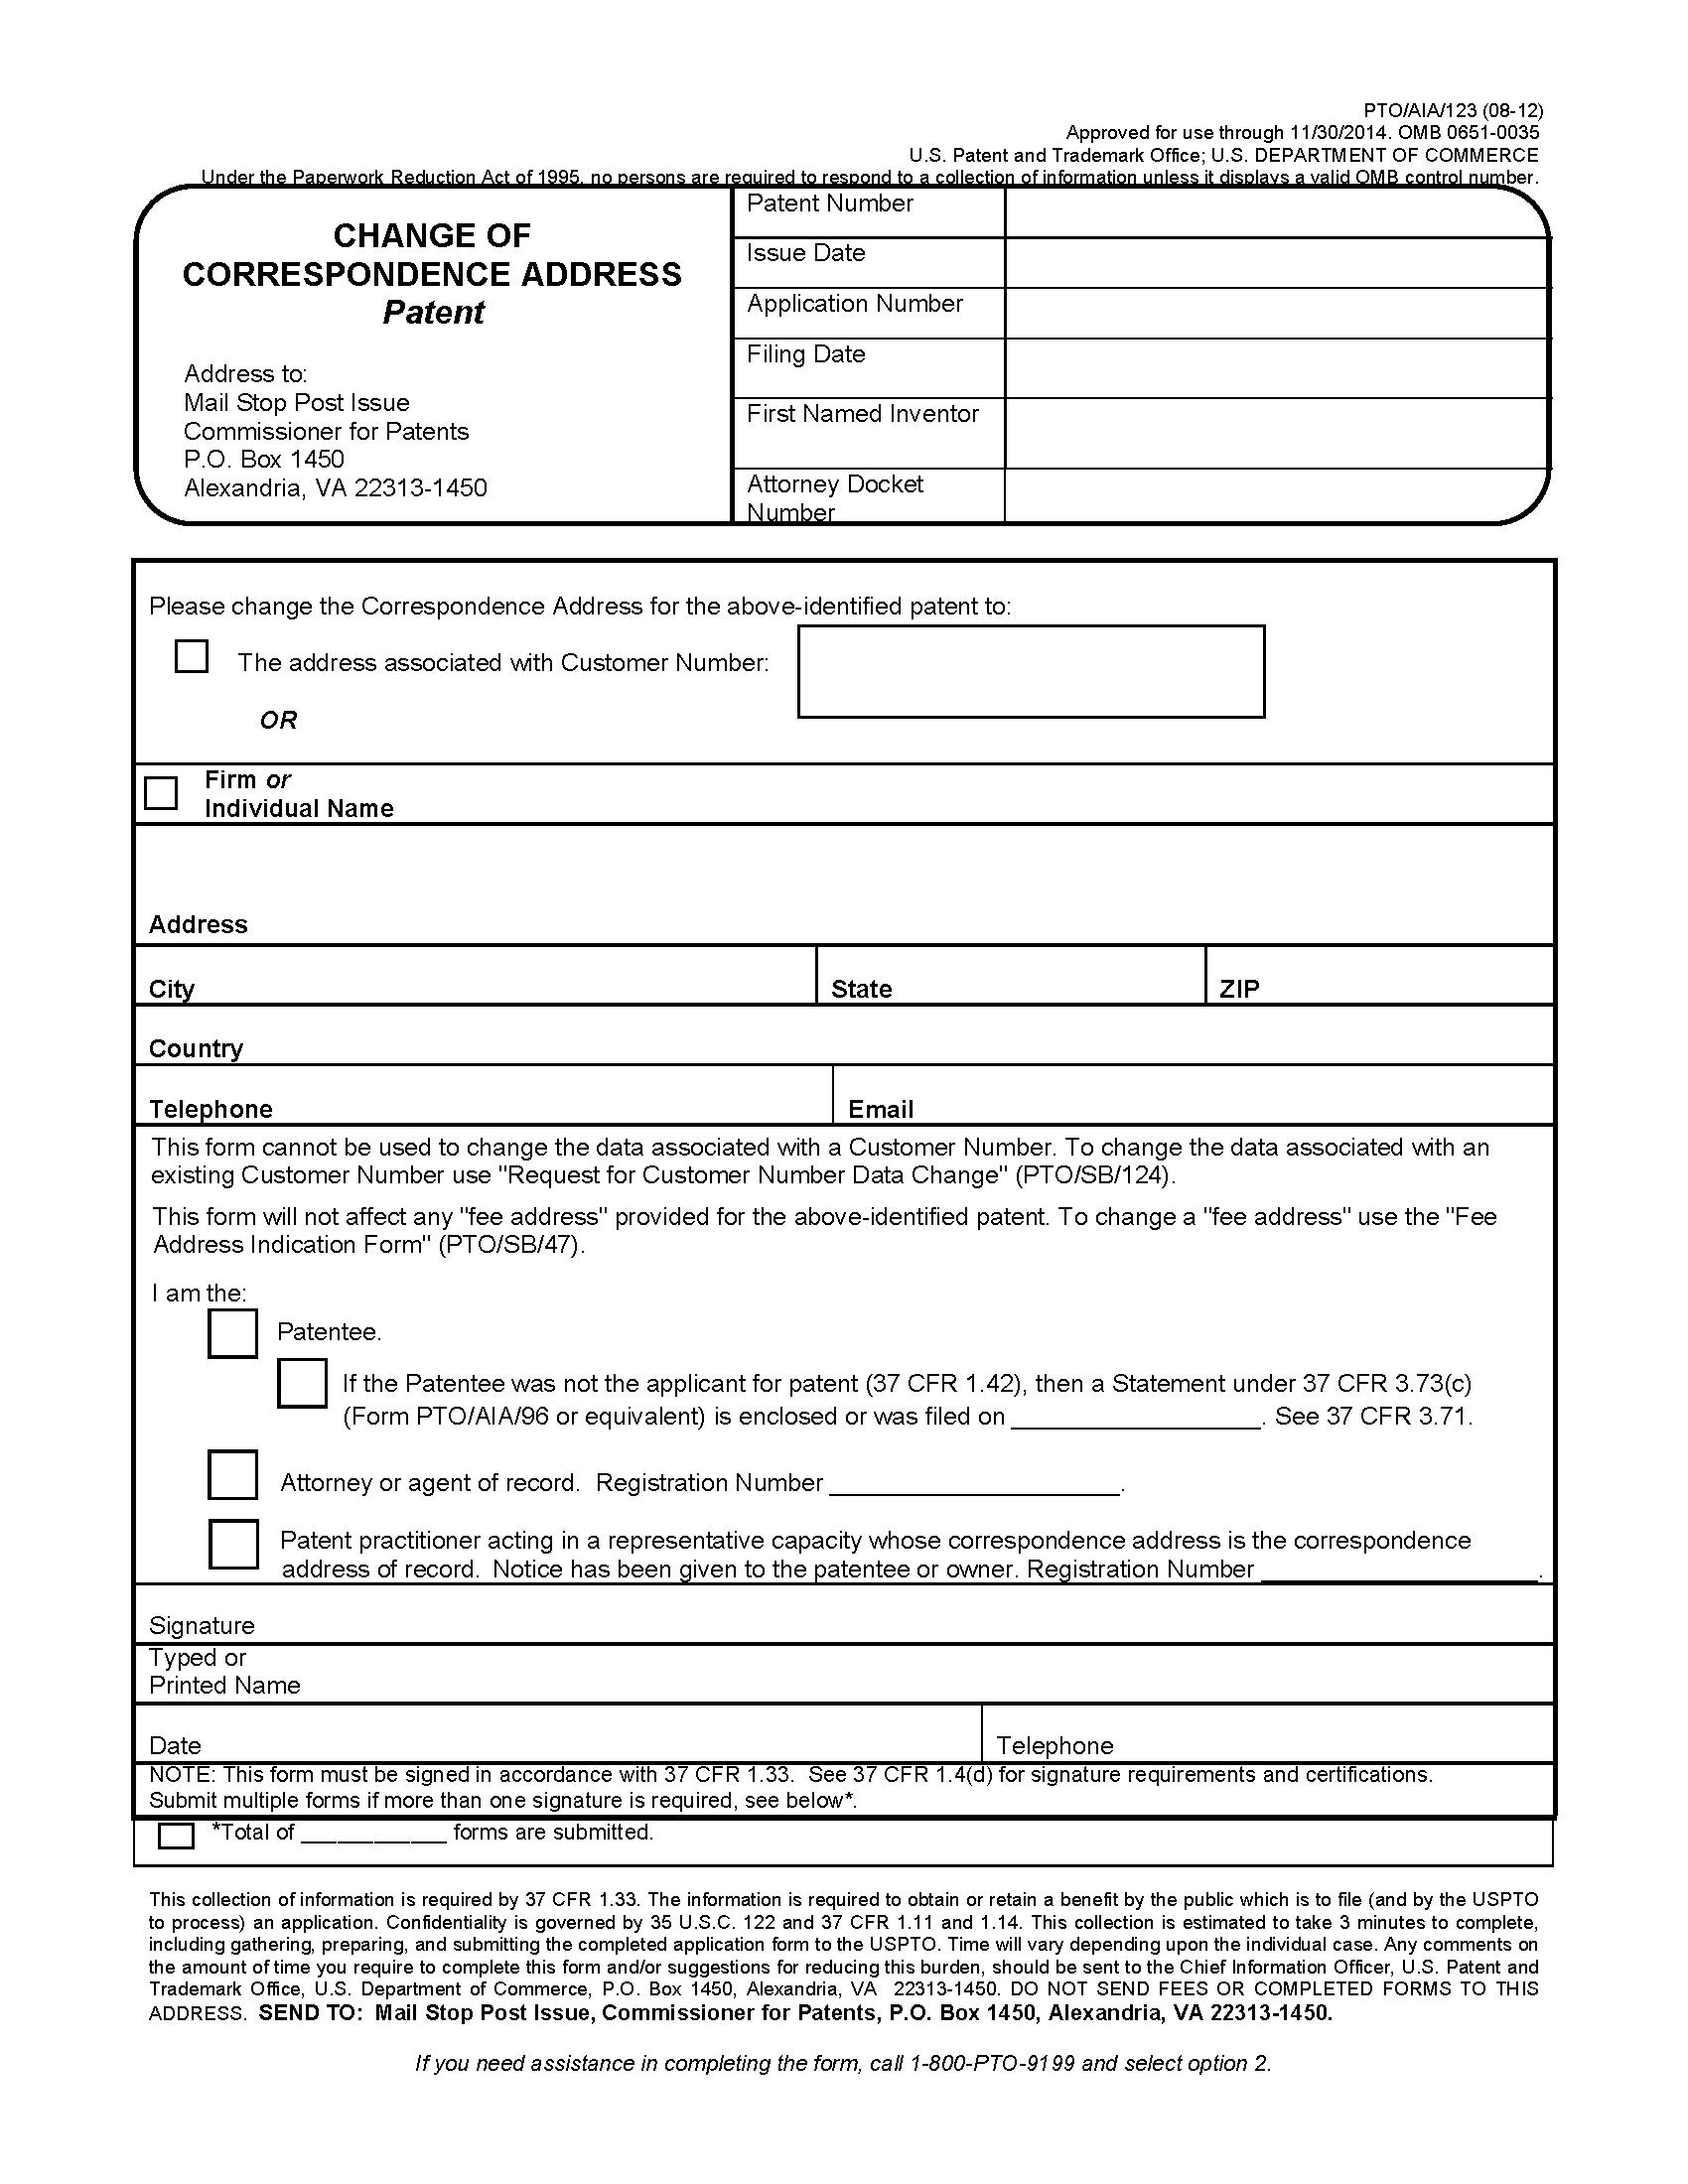 Mpep change of correspondence address patent biocorpaavc